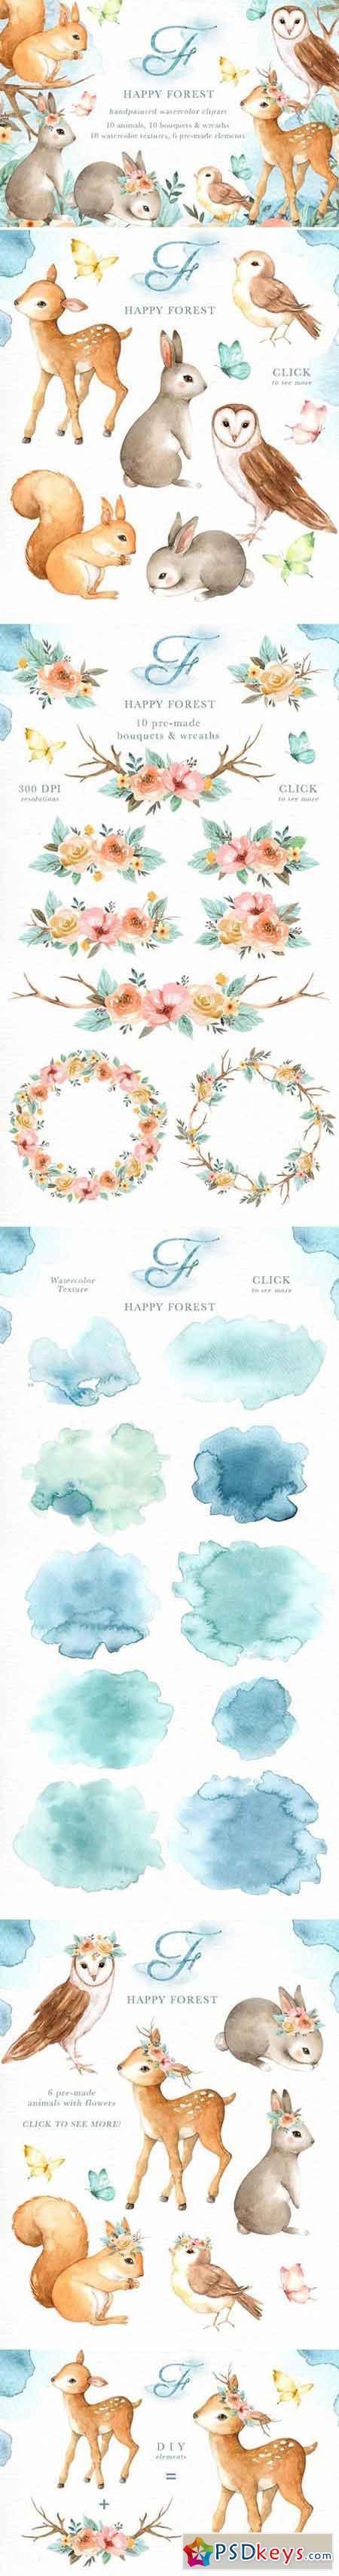 Happy Forest Watercolor Clip Art 2356893